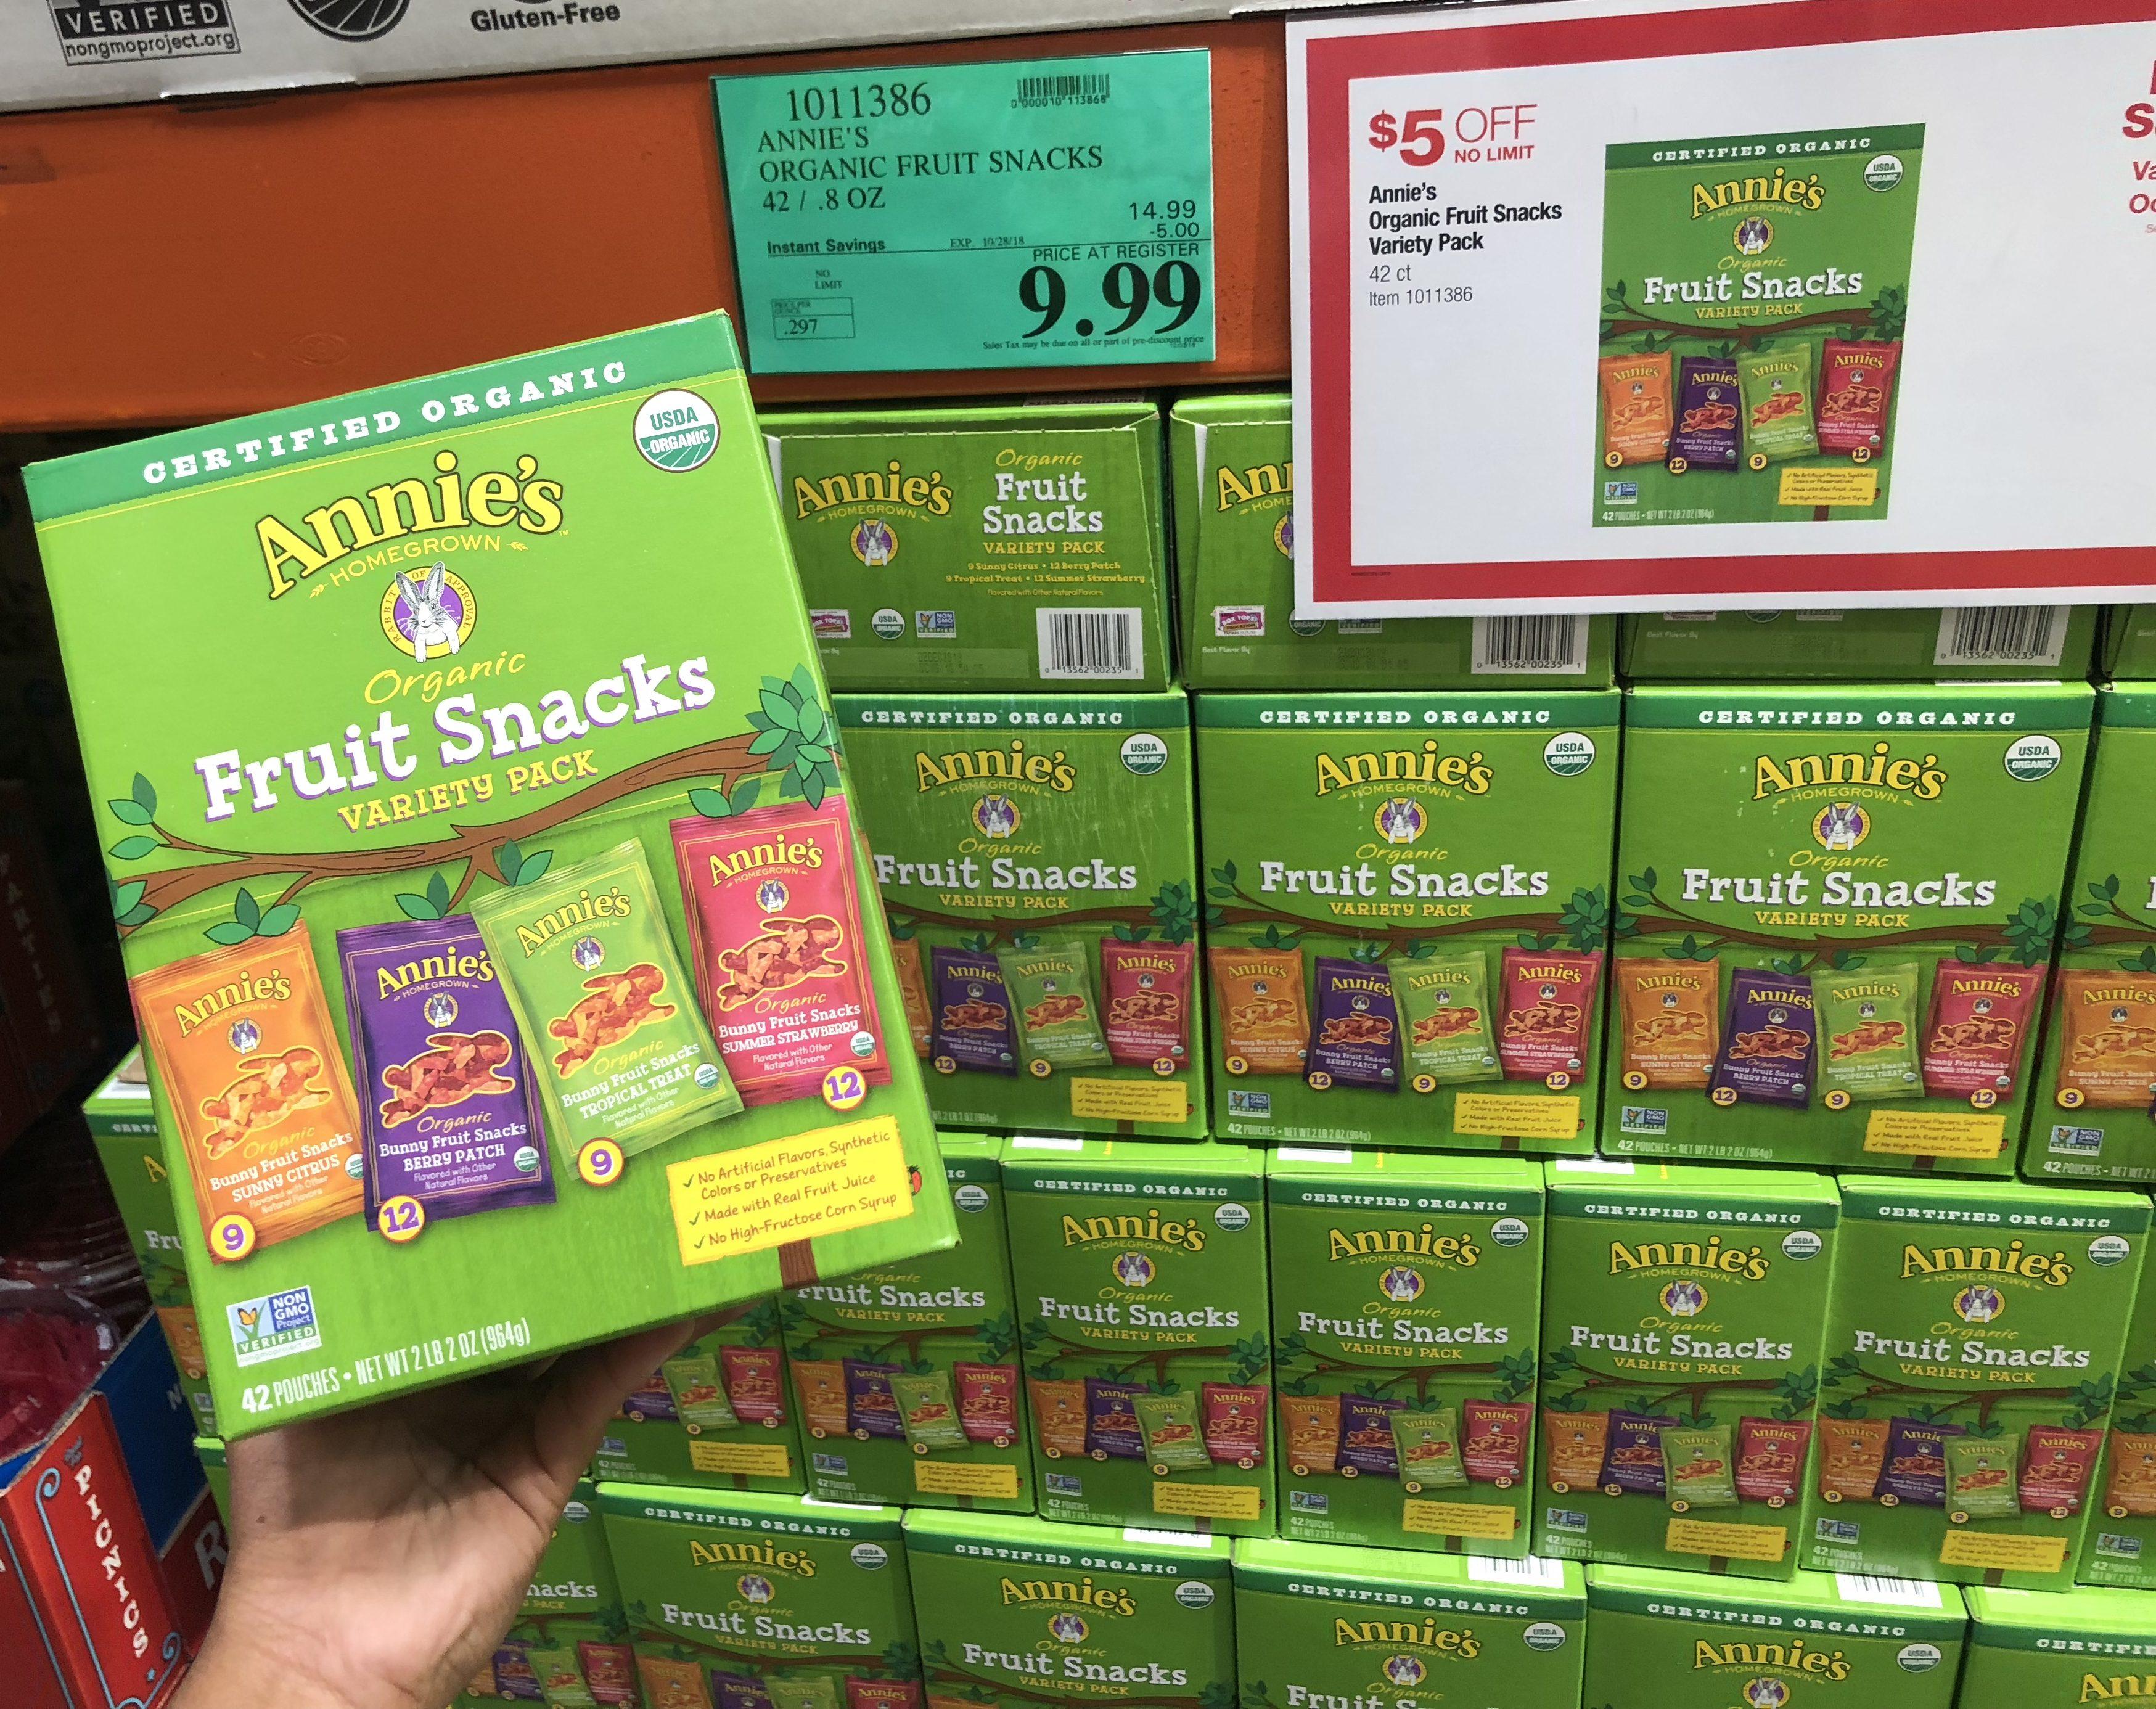 Costco deals October 2018 – Annie's fruit snacks at Costco